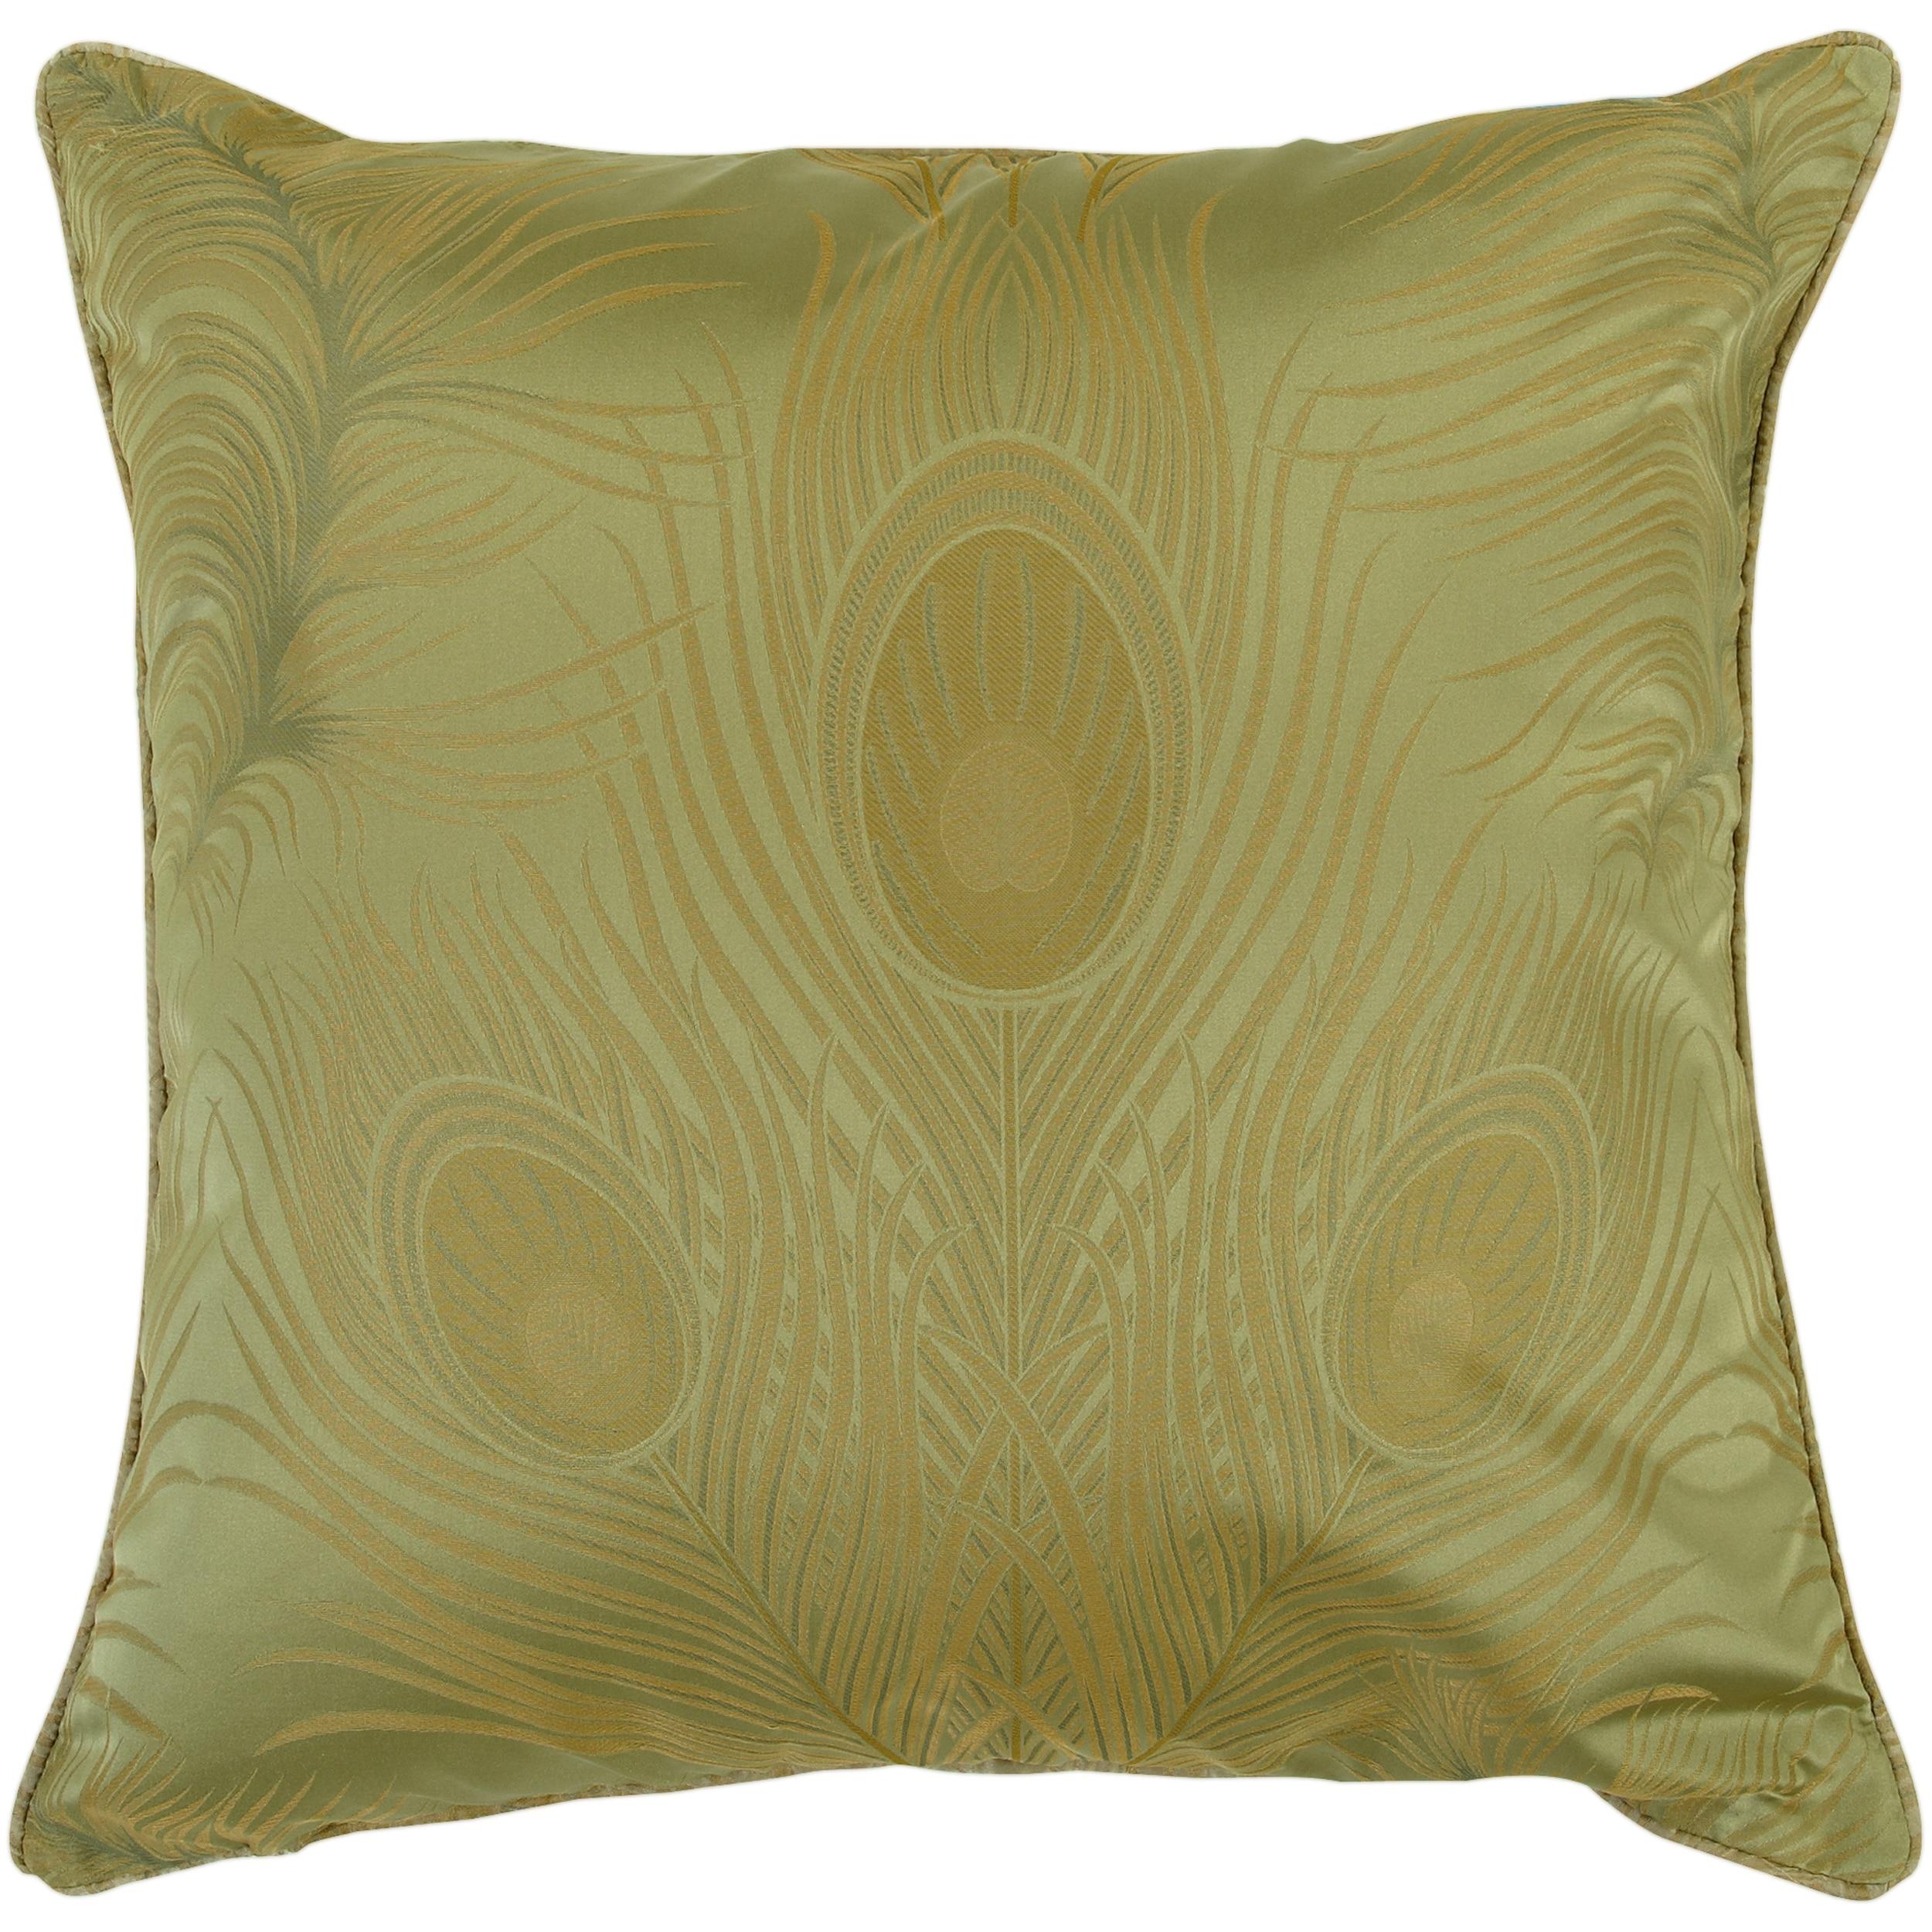 Presh 18-inch Down Decorative Pillow